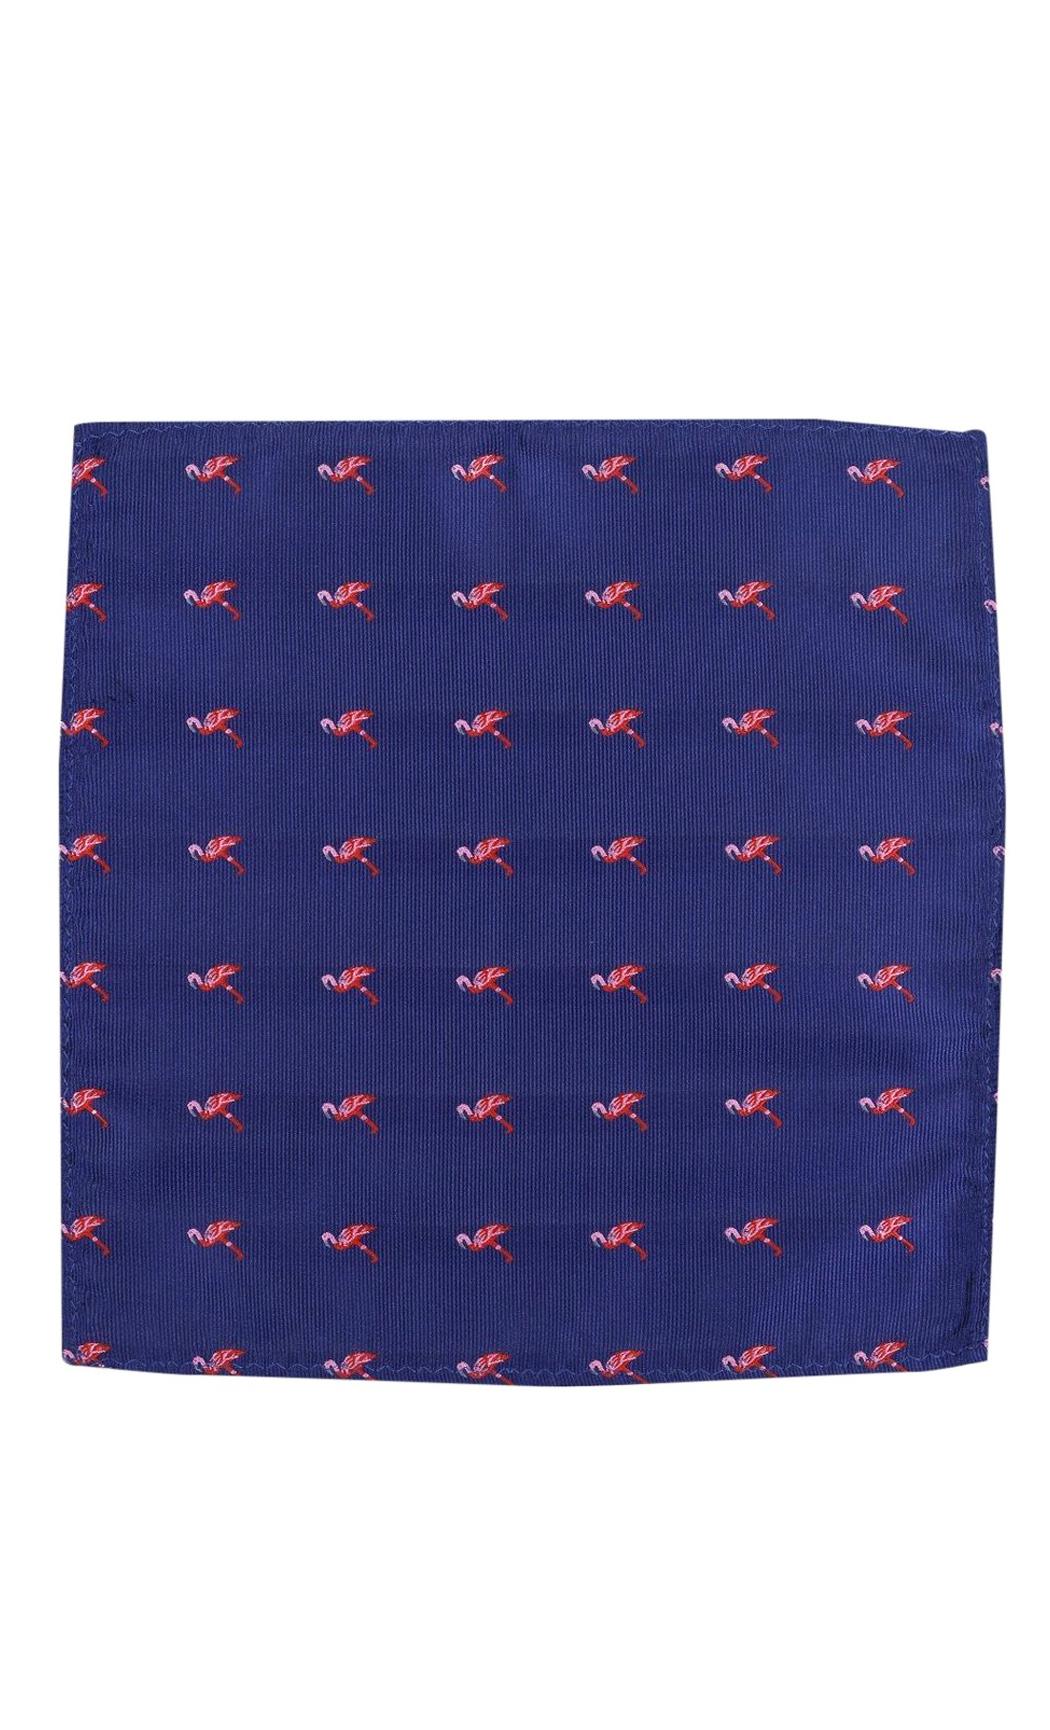 Blue Flamingo Woven Pocket Square. Buy Online